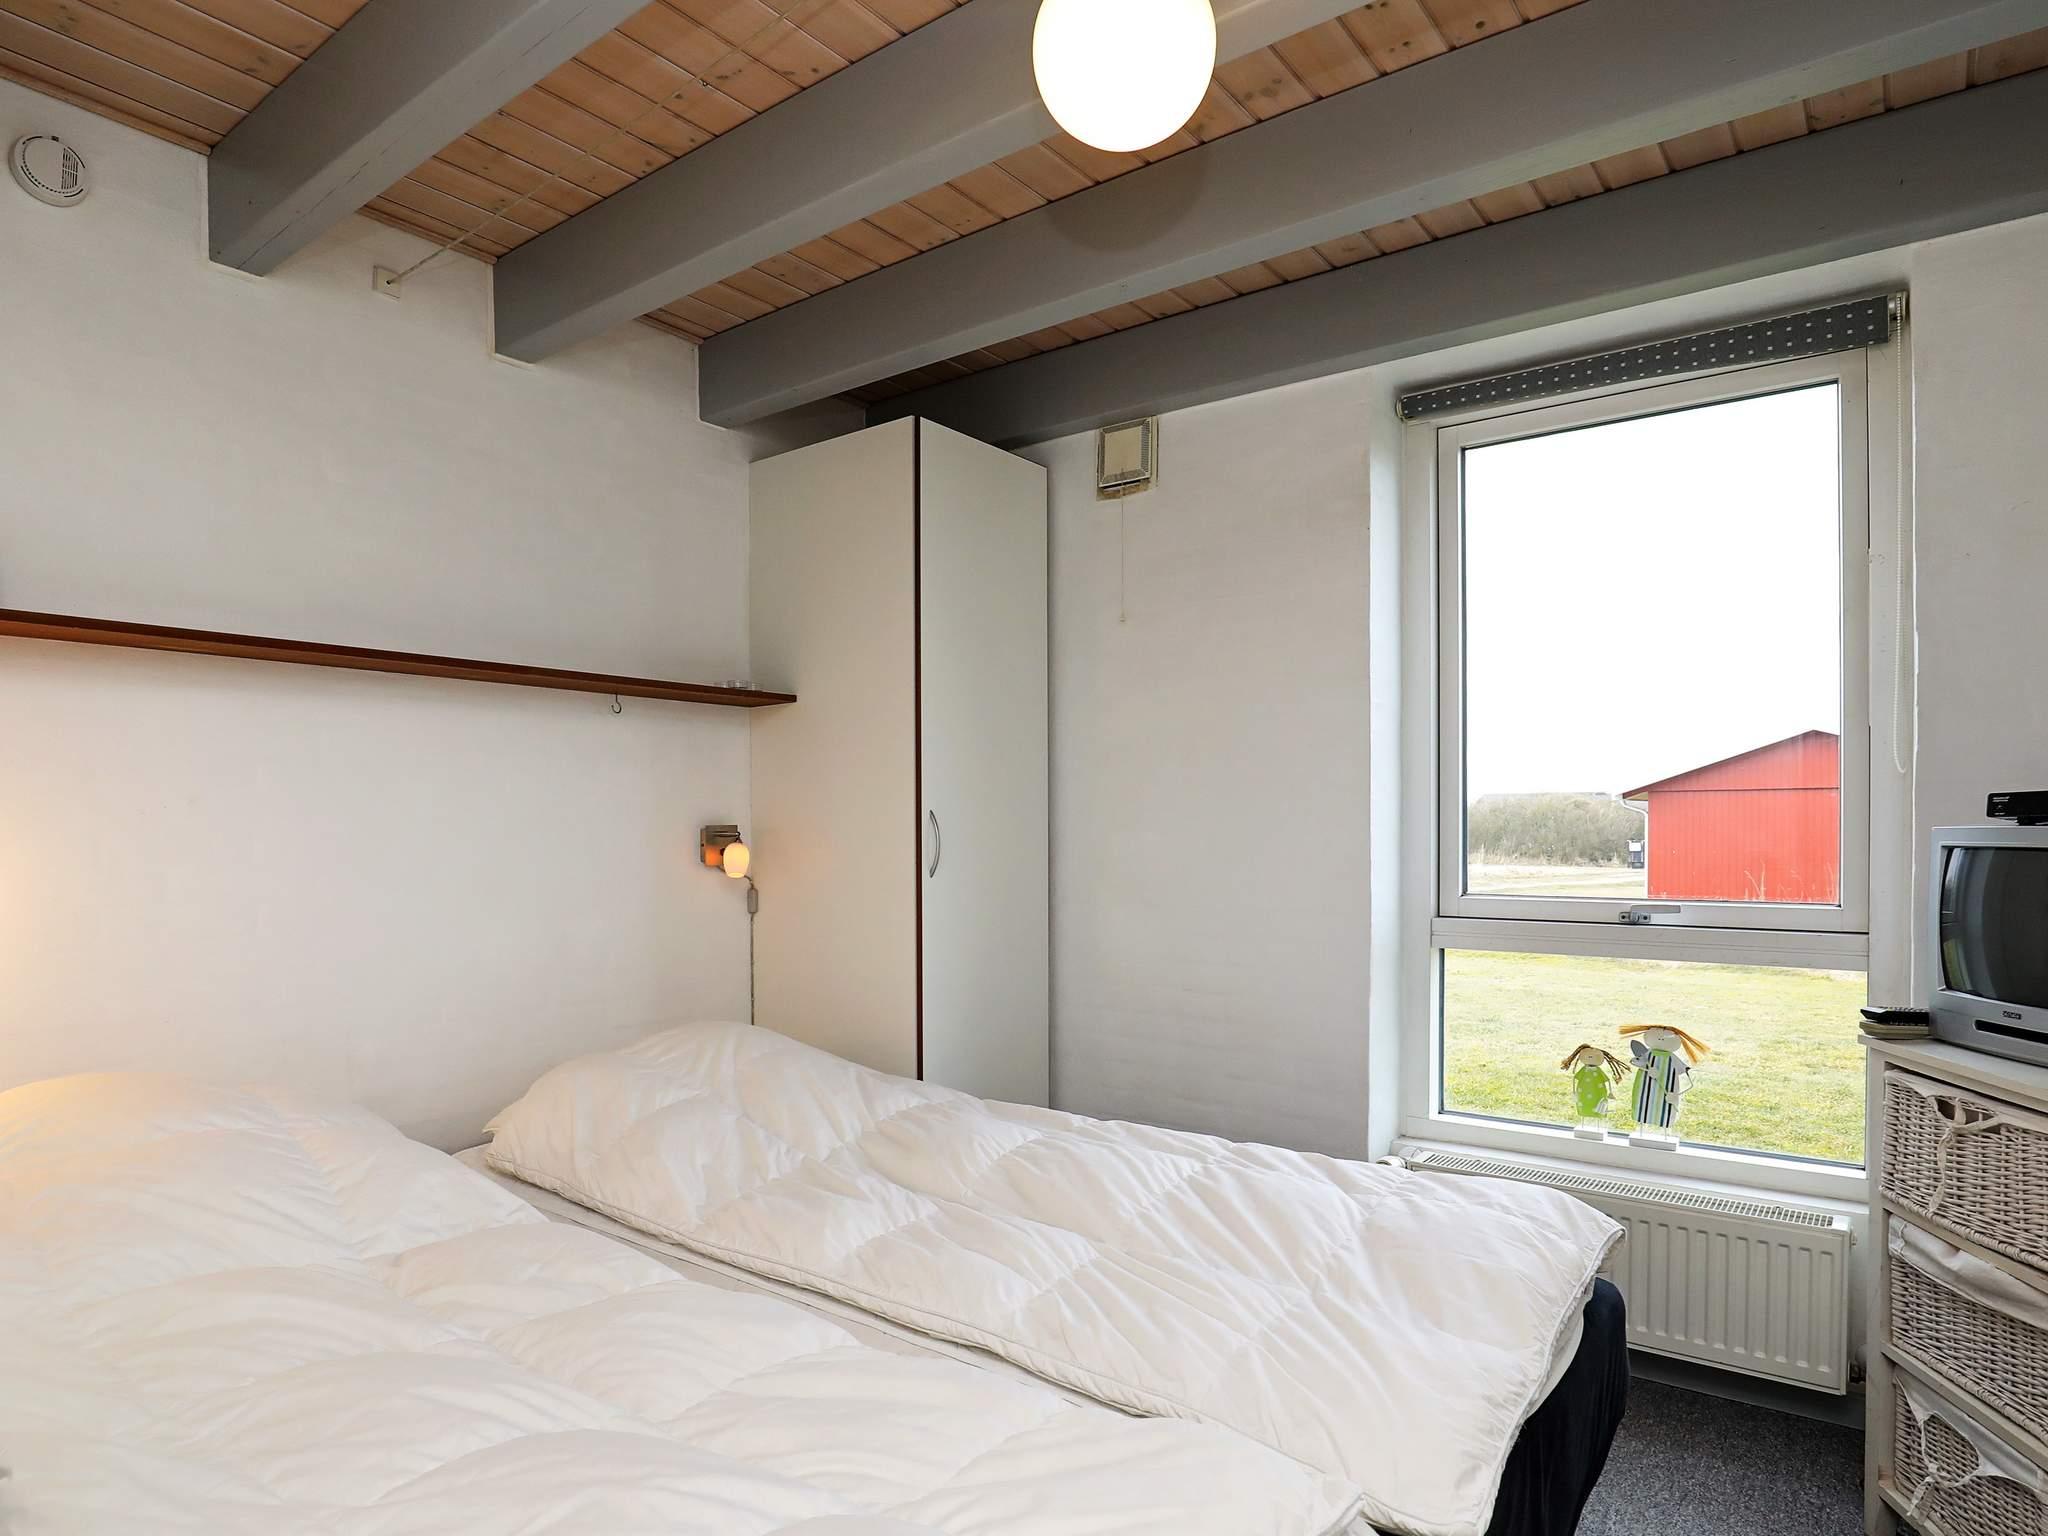 Ferienhaus Haurvig (125276), Hvide Sande, , Westjütland, Dänemark, Bild 10